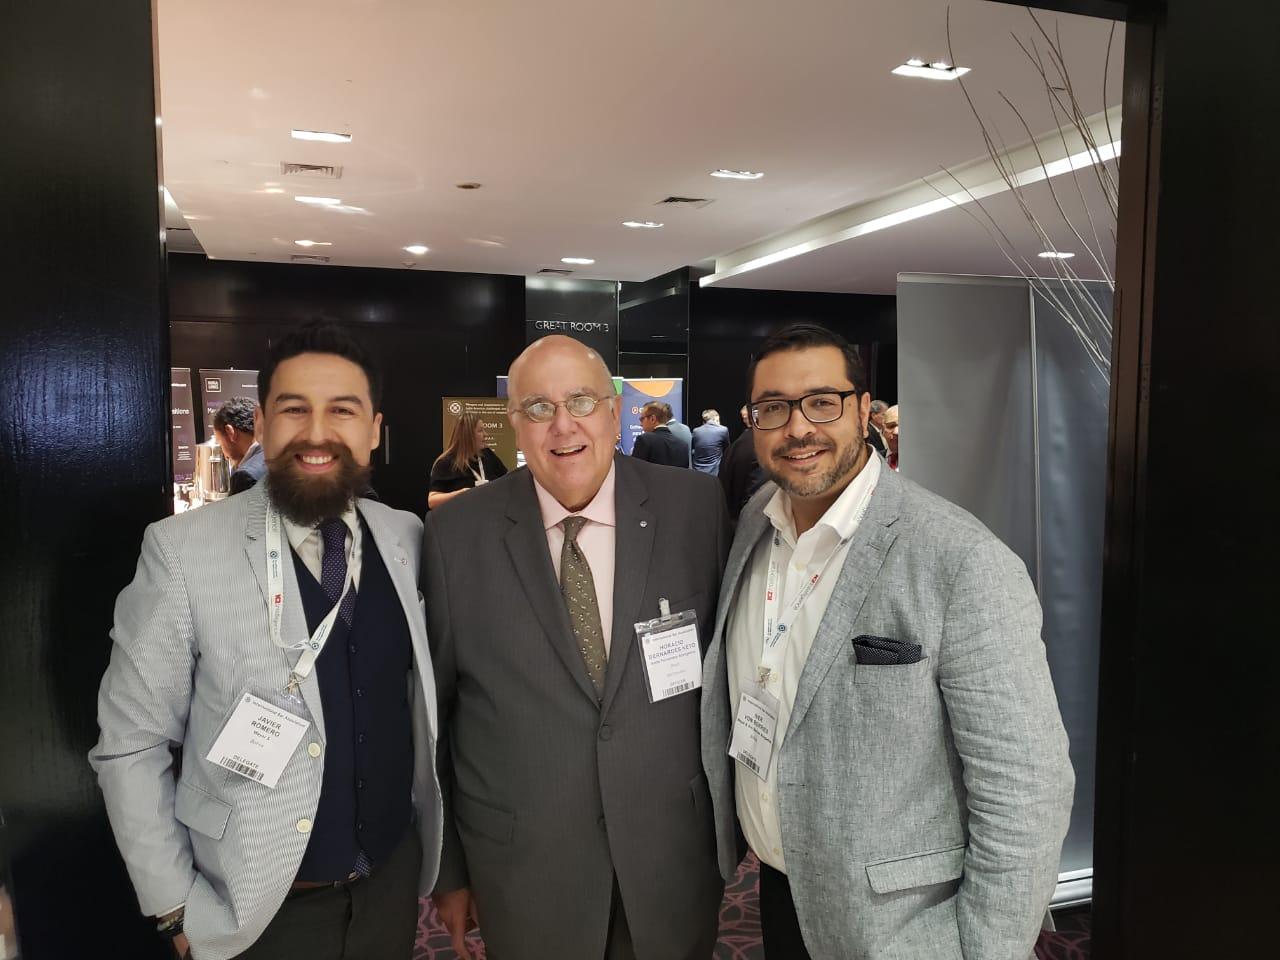 Iver Von Borries participa del Latin American Regional Forum and the IBA Corporate and M&A Law Committee que se desarrolla enSantiago de Chile